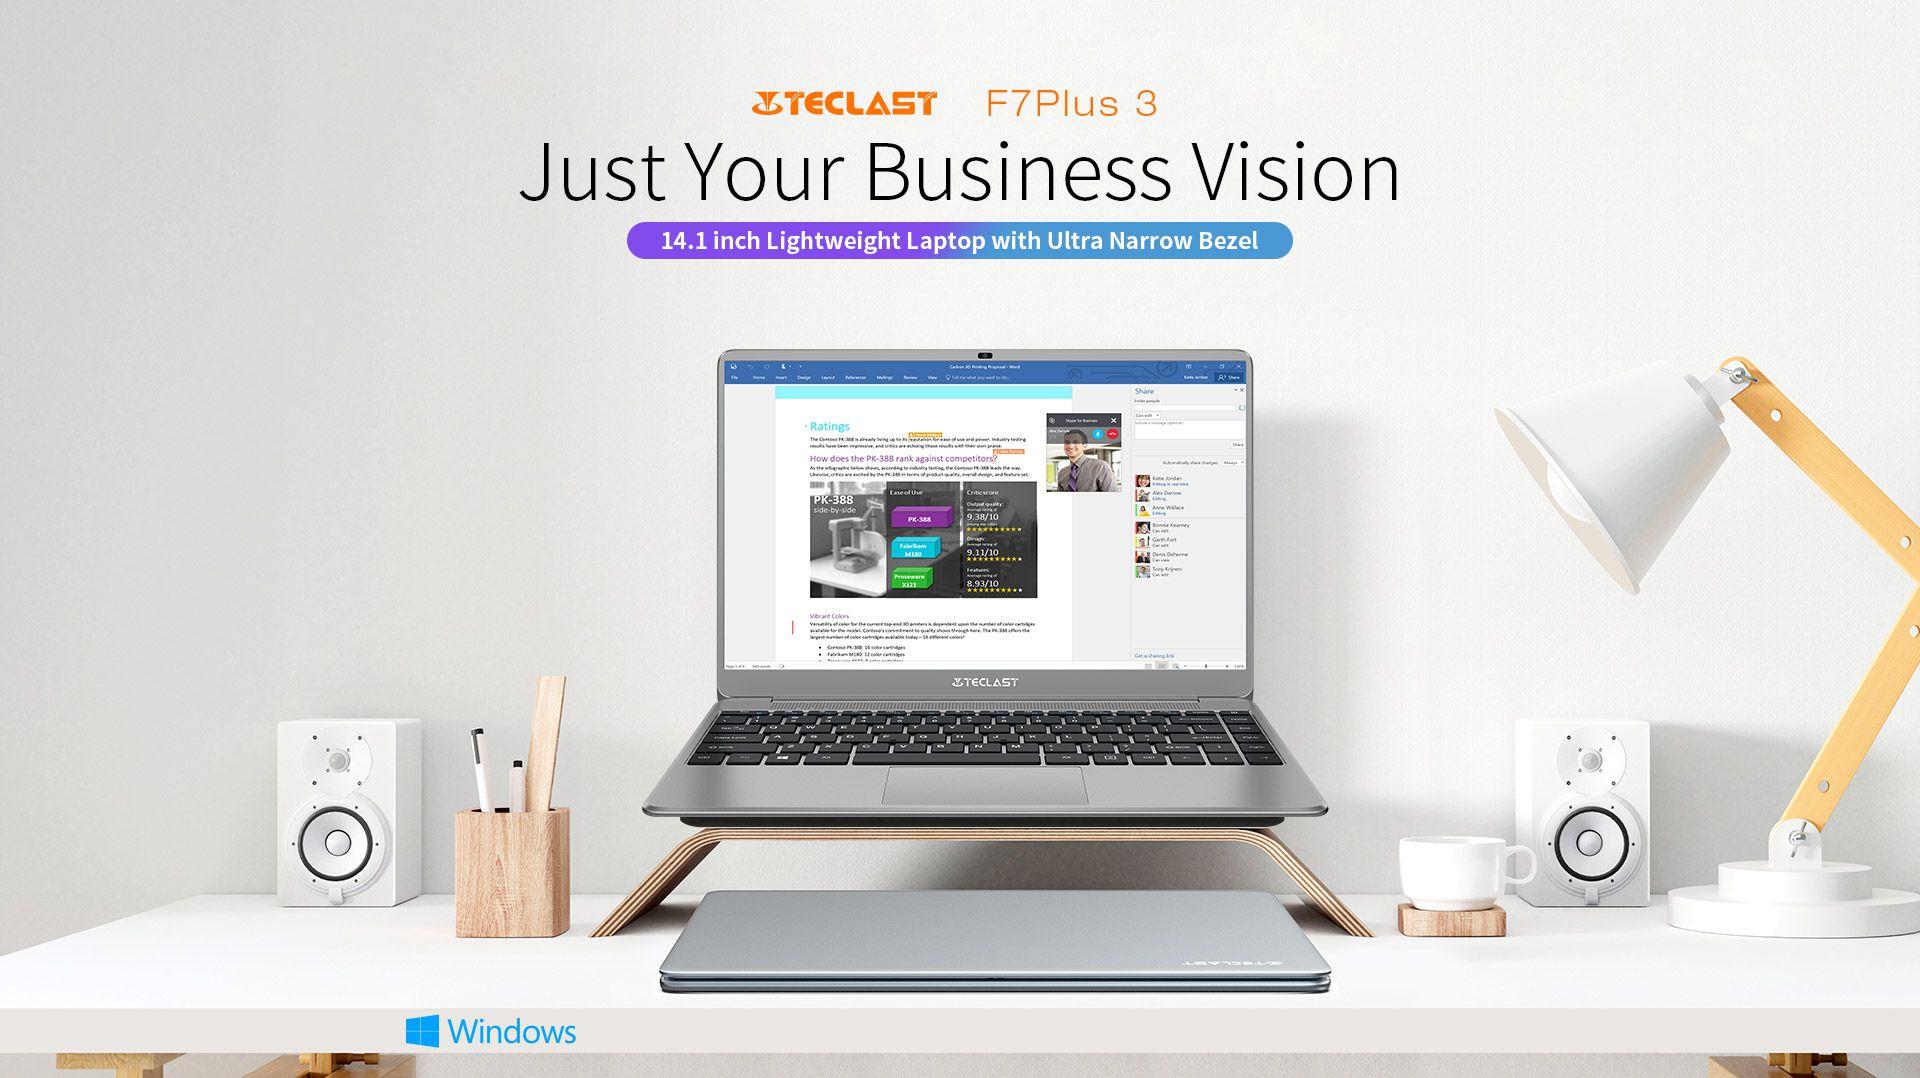 Offerta-Teclast-F7-Plus-3-5 Recensione completa KUU Xbook, ultrabook cinese 2020